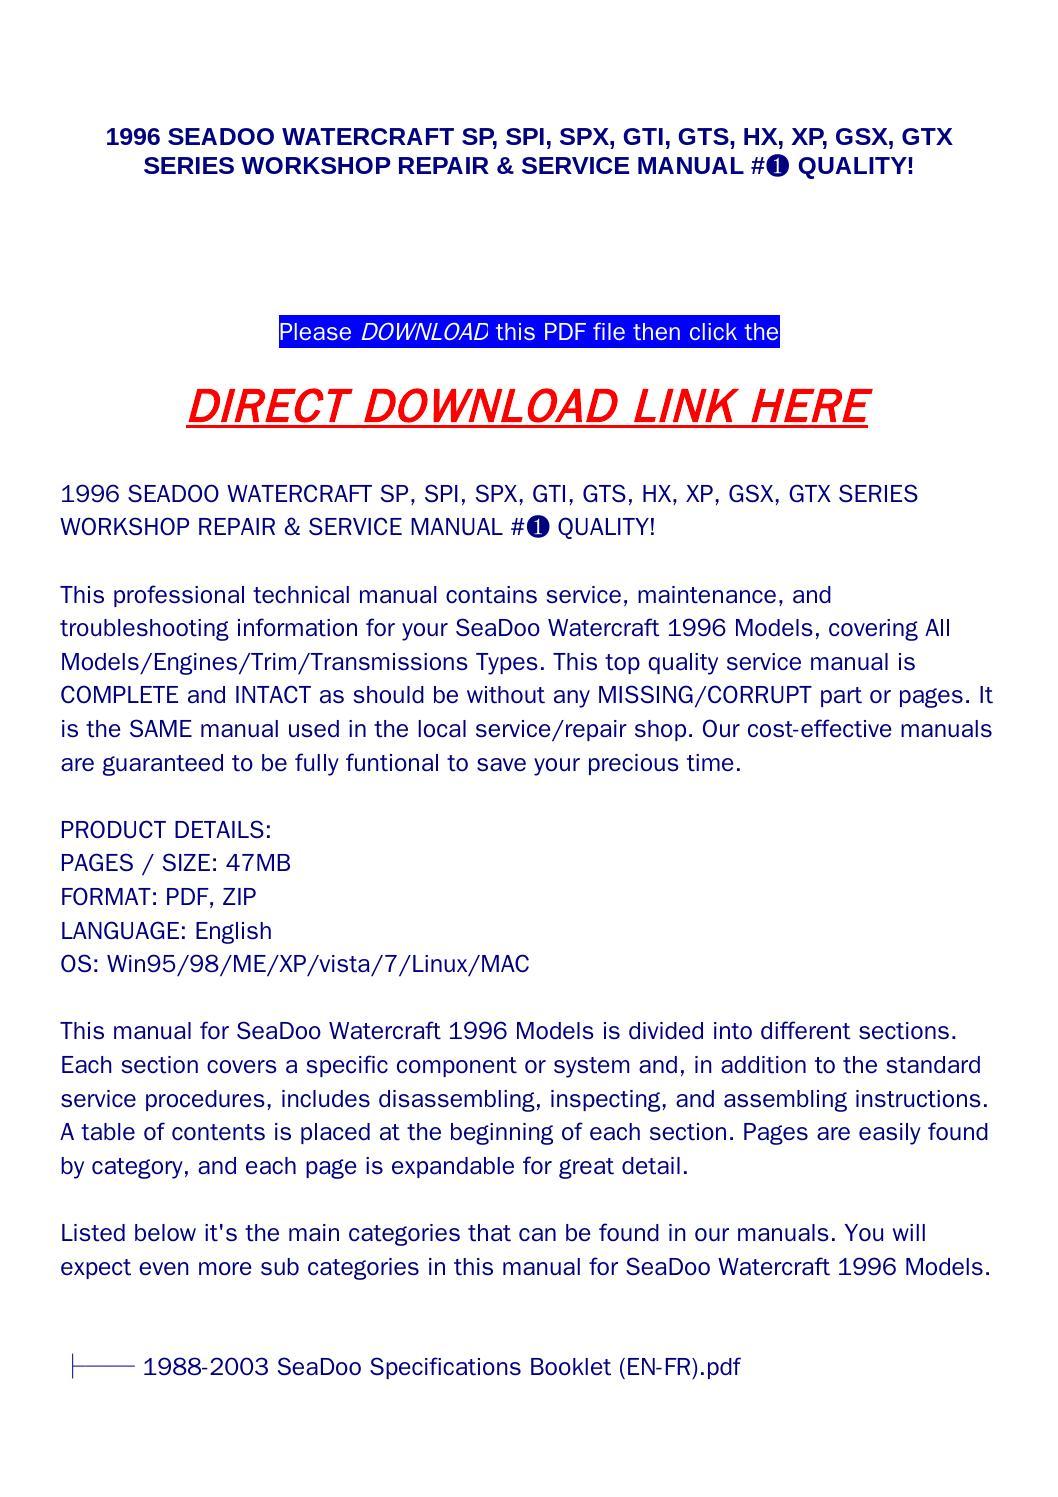 pay for sea doo xp hx 1996 service repair manual download Array - seadoo hx repair  manual ebook rh seadoo hx repair manual ebook spirulinas de